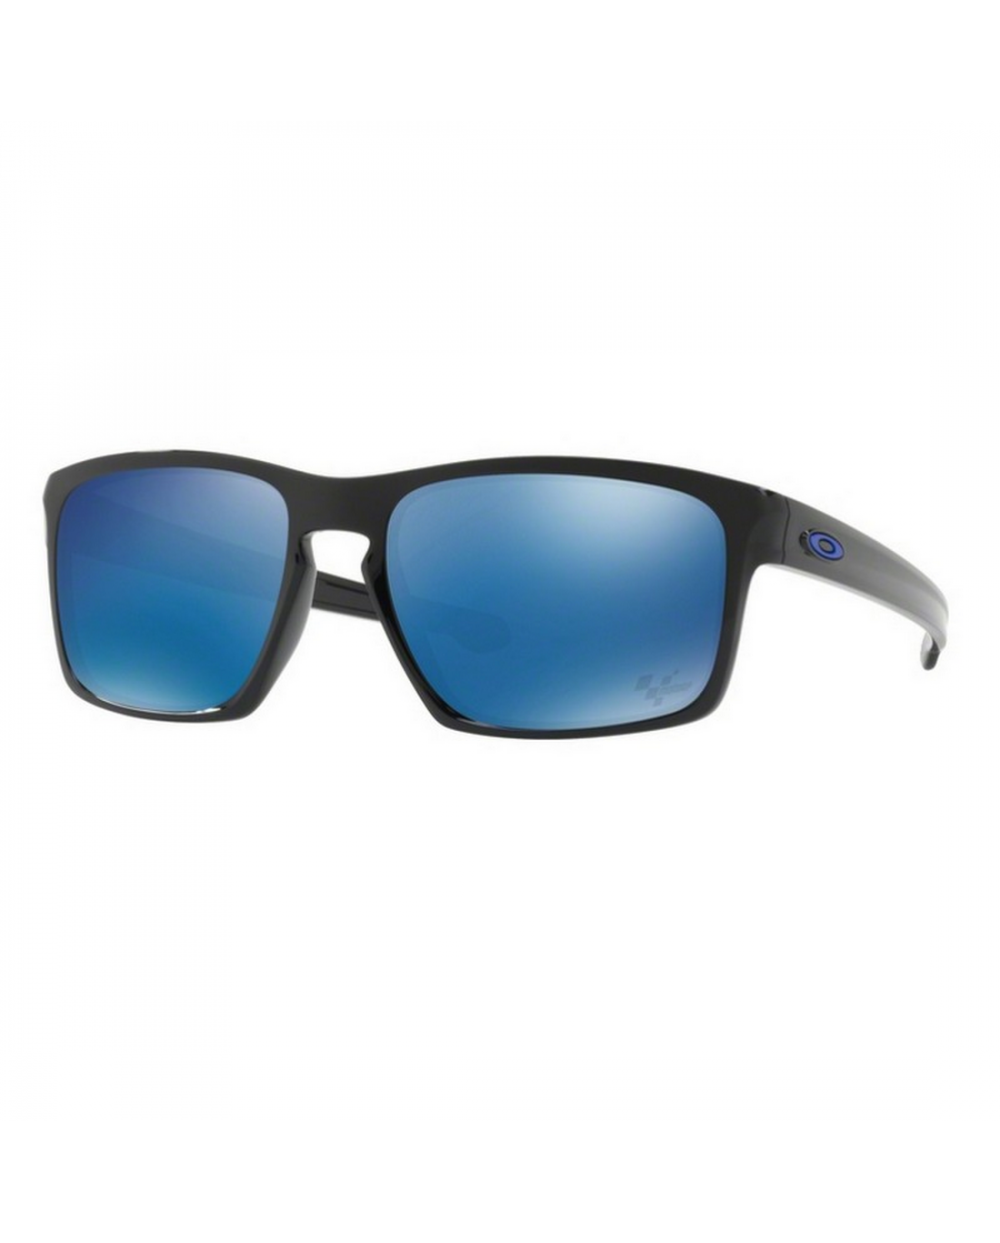 Oakley sonnenbrille 9262 SILVER originalverpackung garantie italien